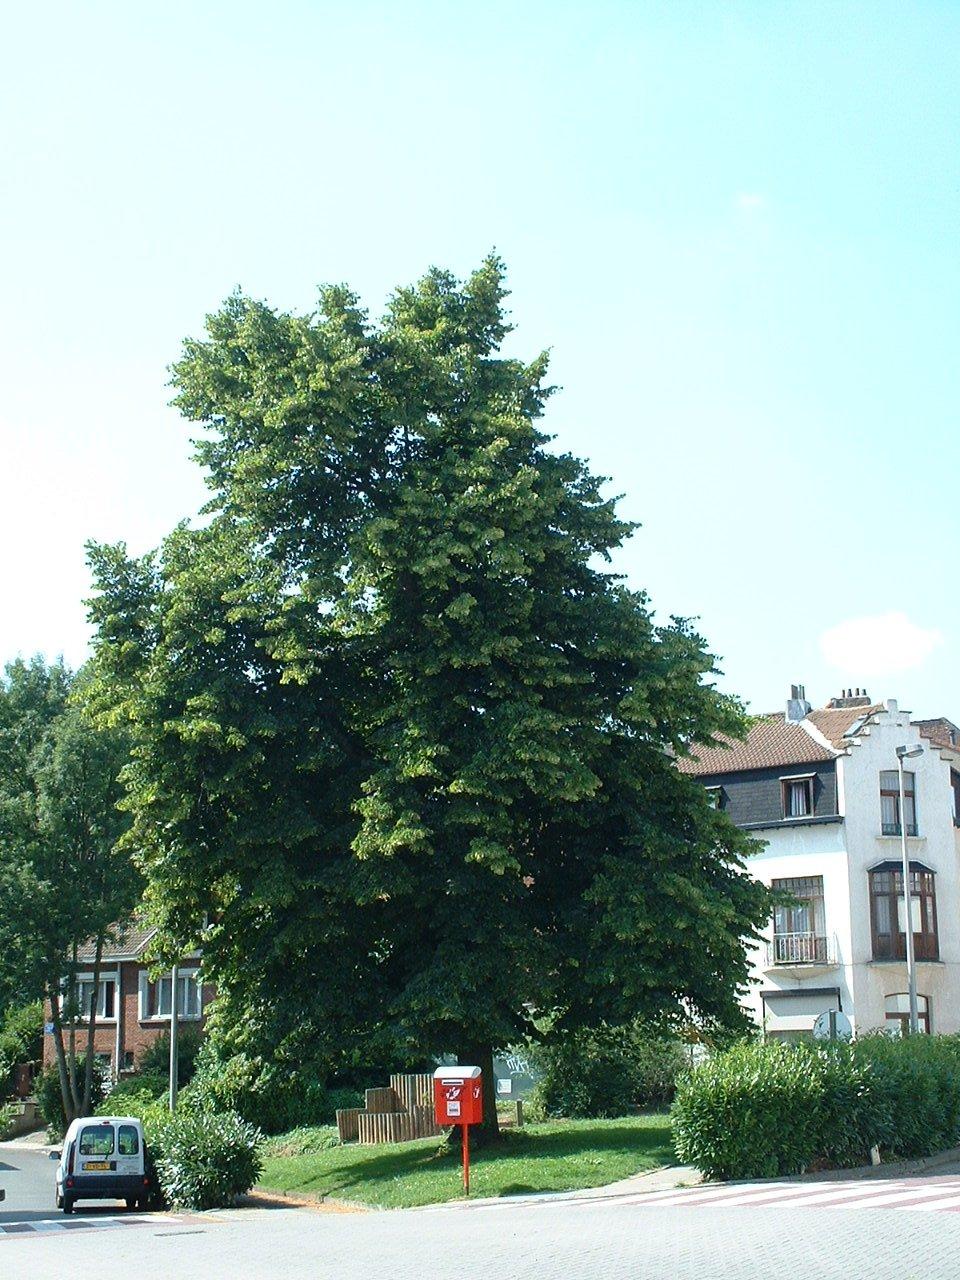 Tilleul à petites feuilles – Watermael-Boitsfort, Rue Gratès –  17 Juillet 2002